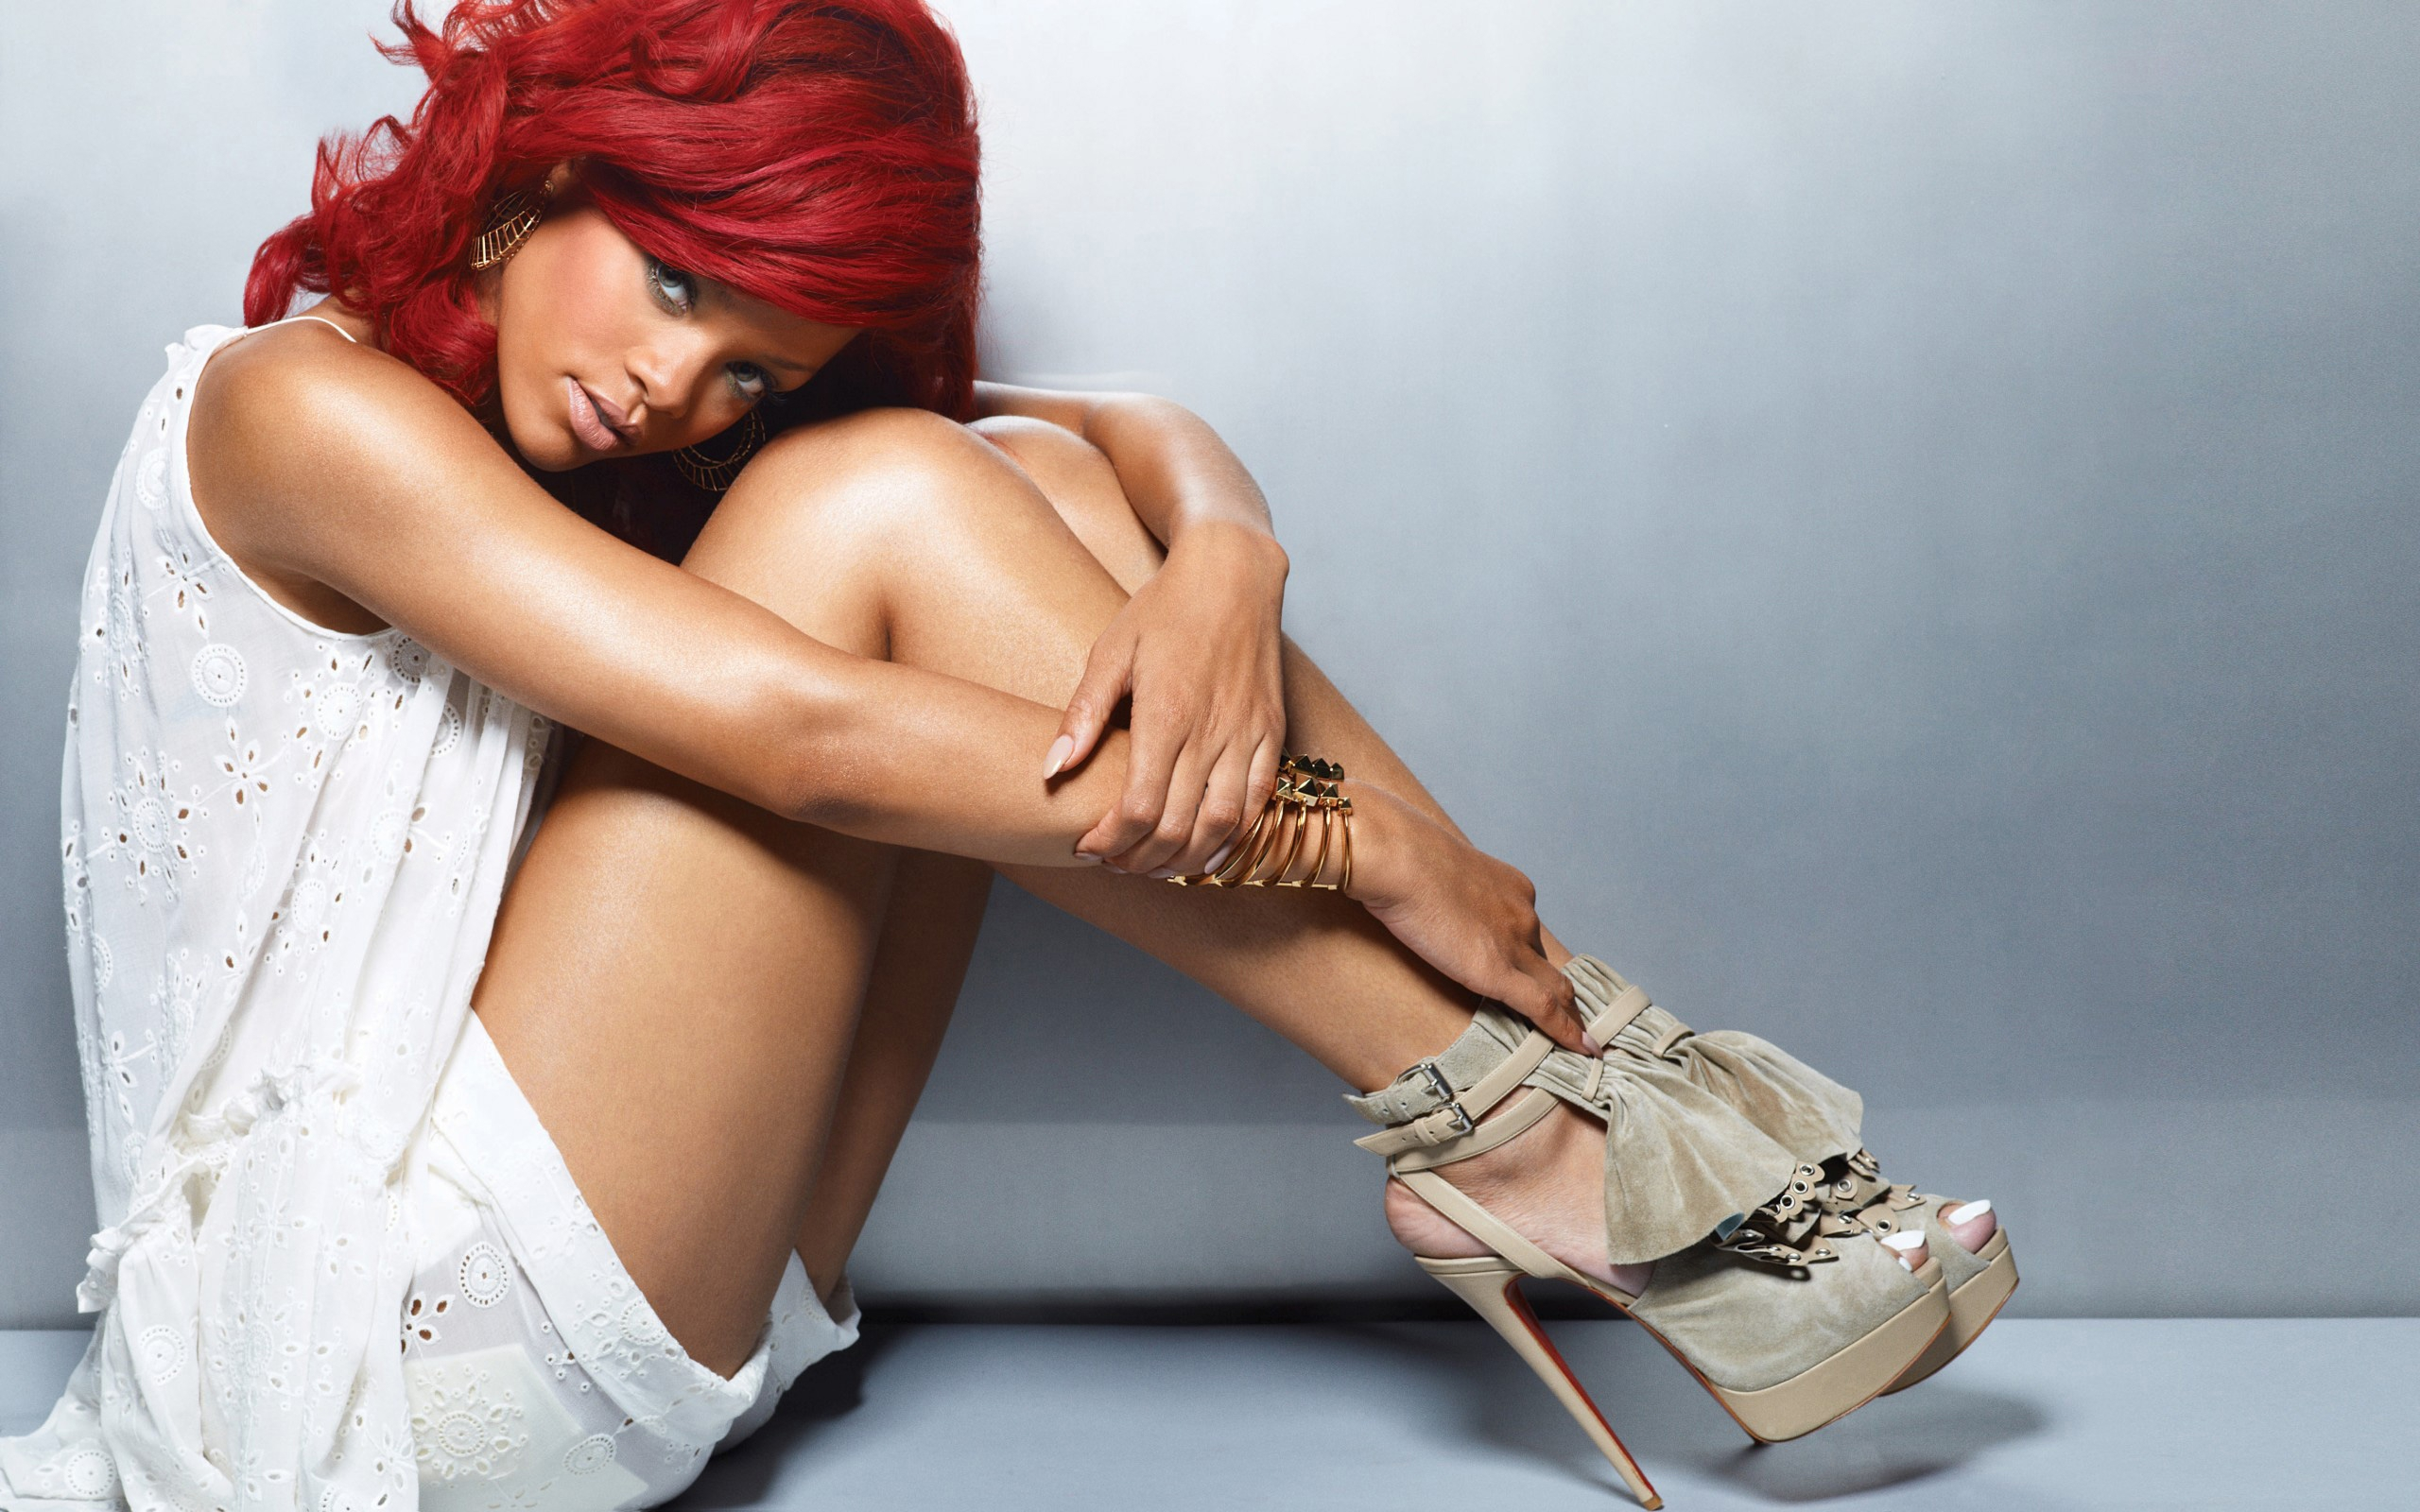 Rihanna Wallpaper For Laptop